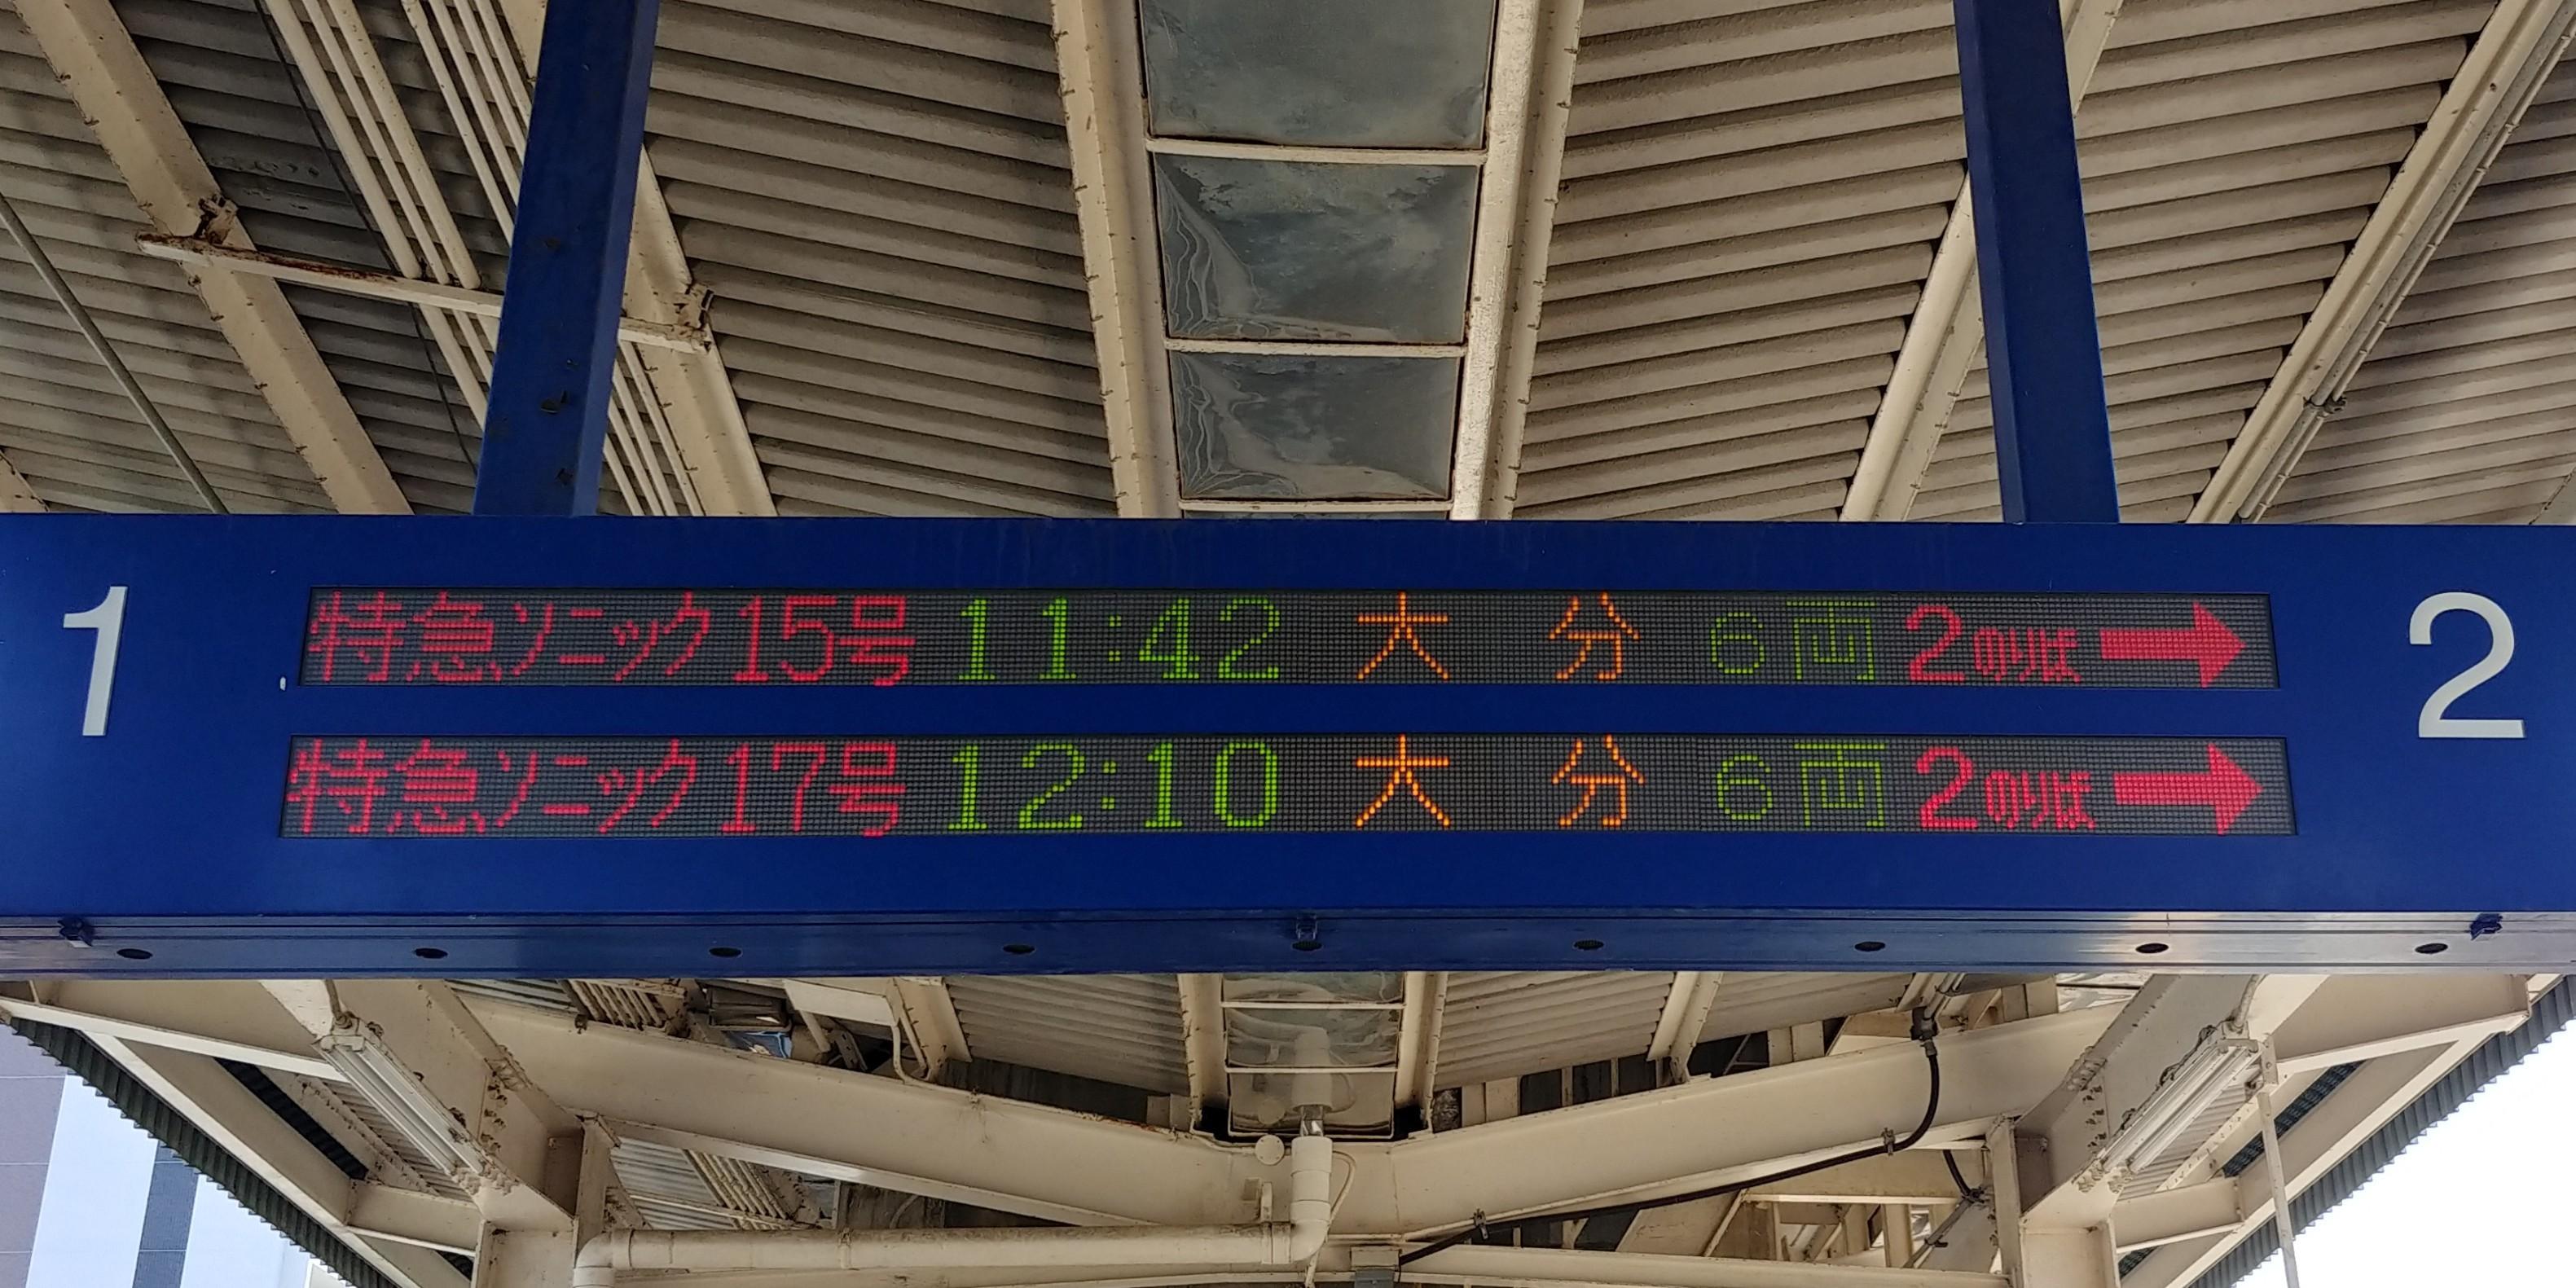 f:id:kishuji-kaisoku:20200211130905j:image